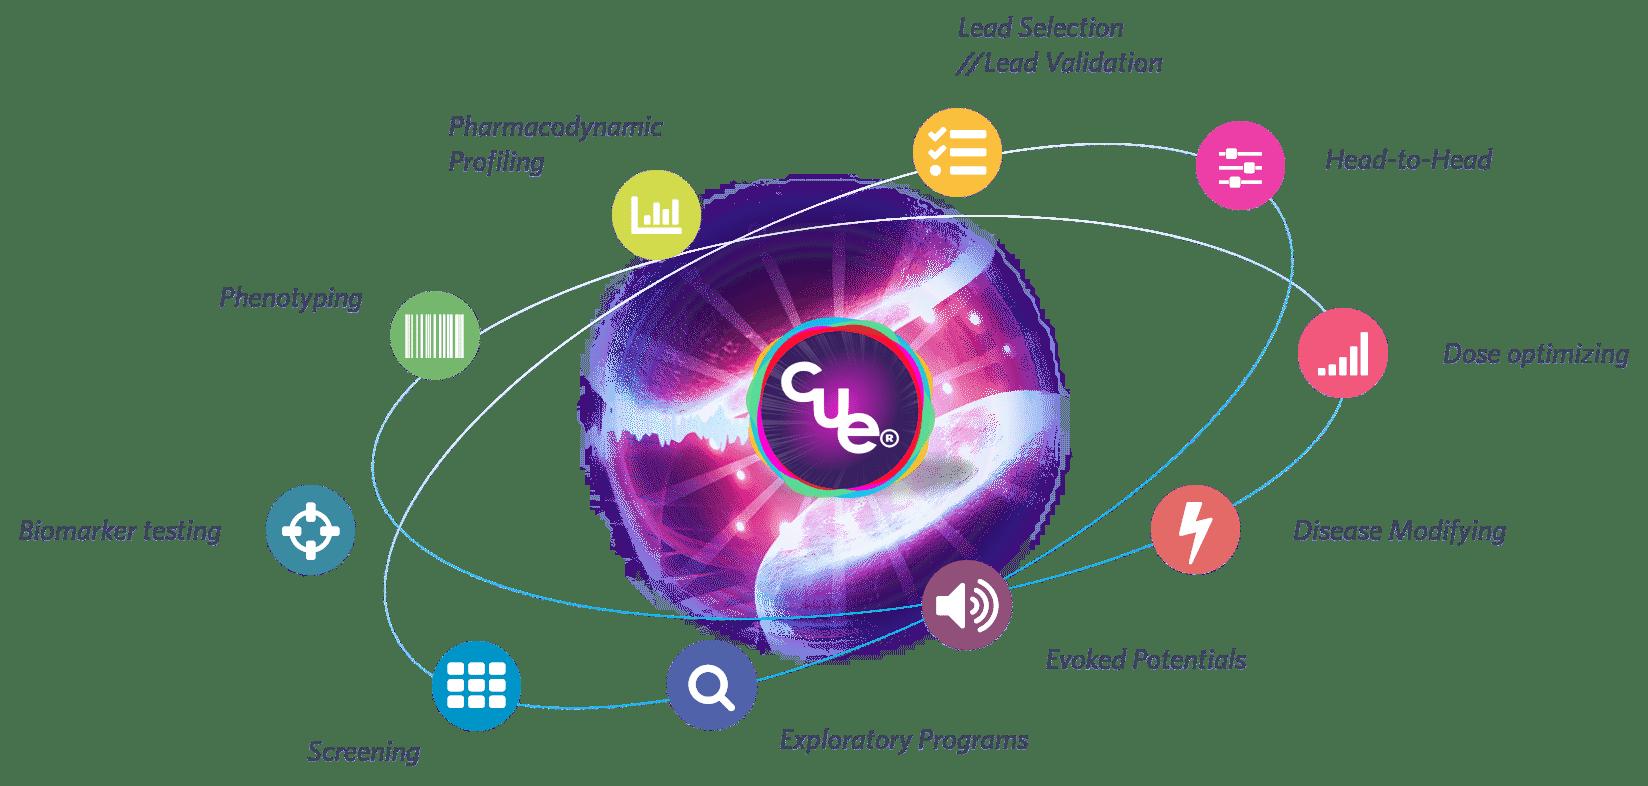 Predictive-in-vivo-platform